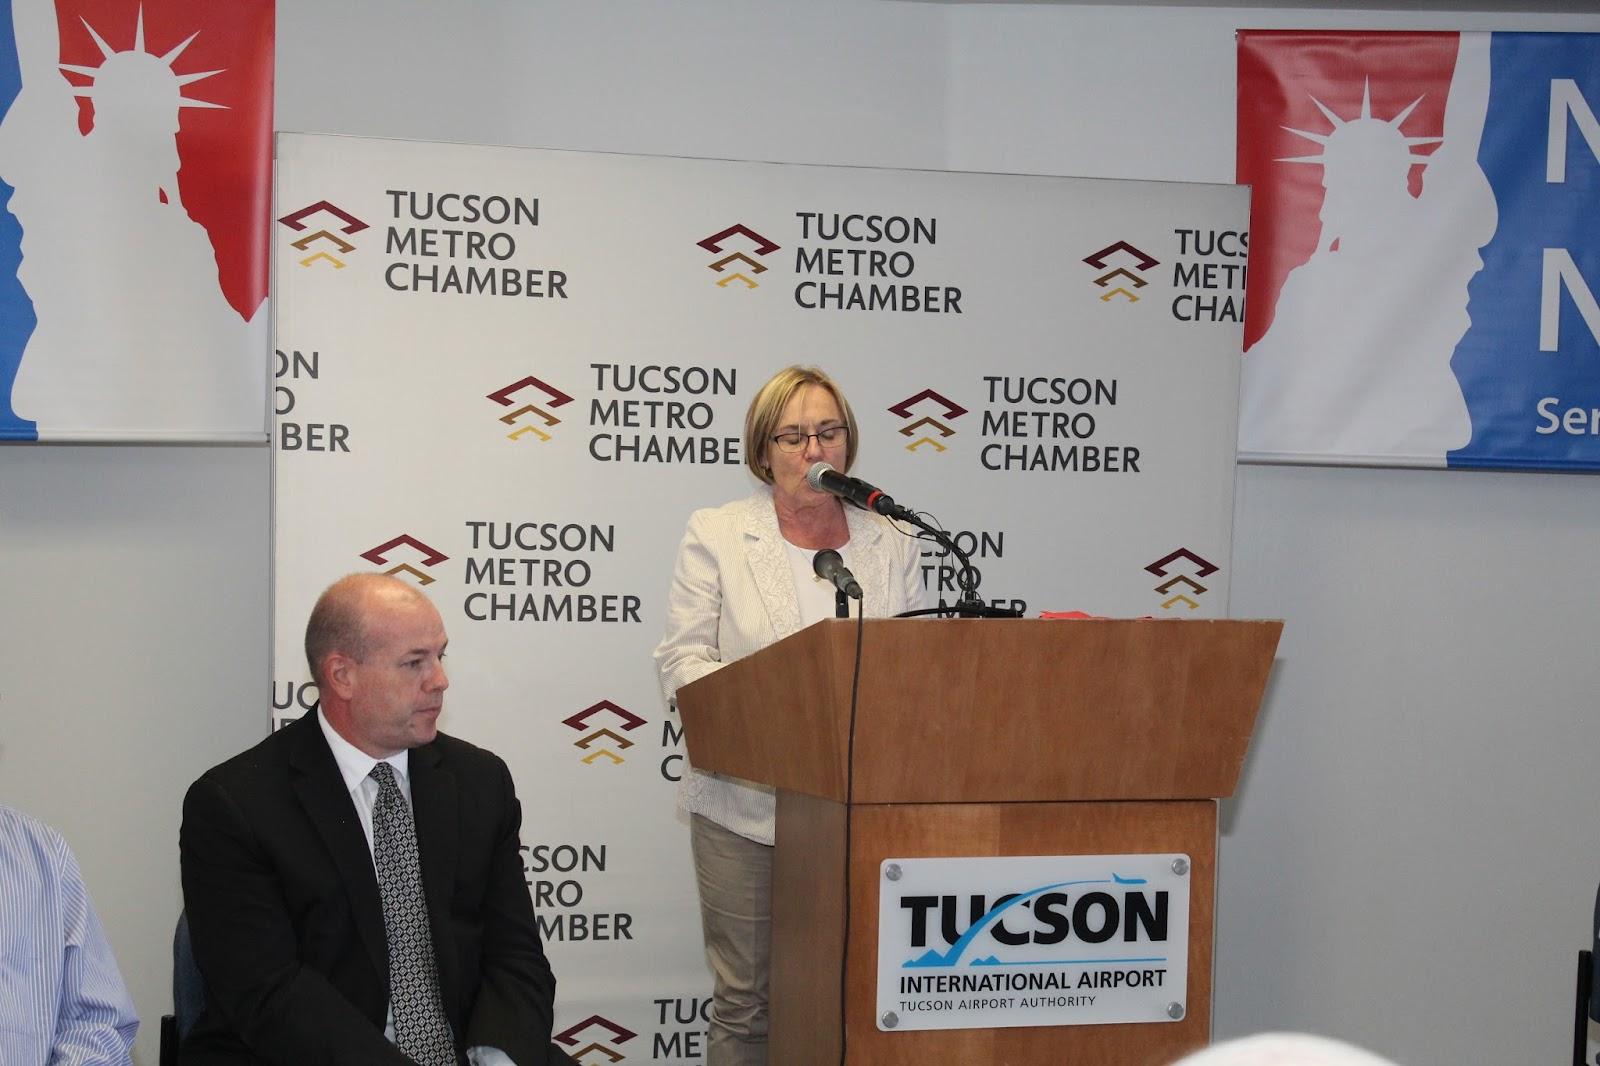 Tucson - JFK Non-Stop Route Announcement - IMG_3216.JPG